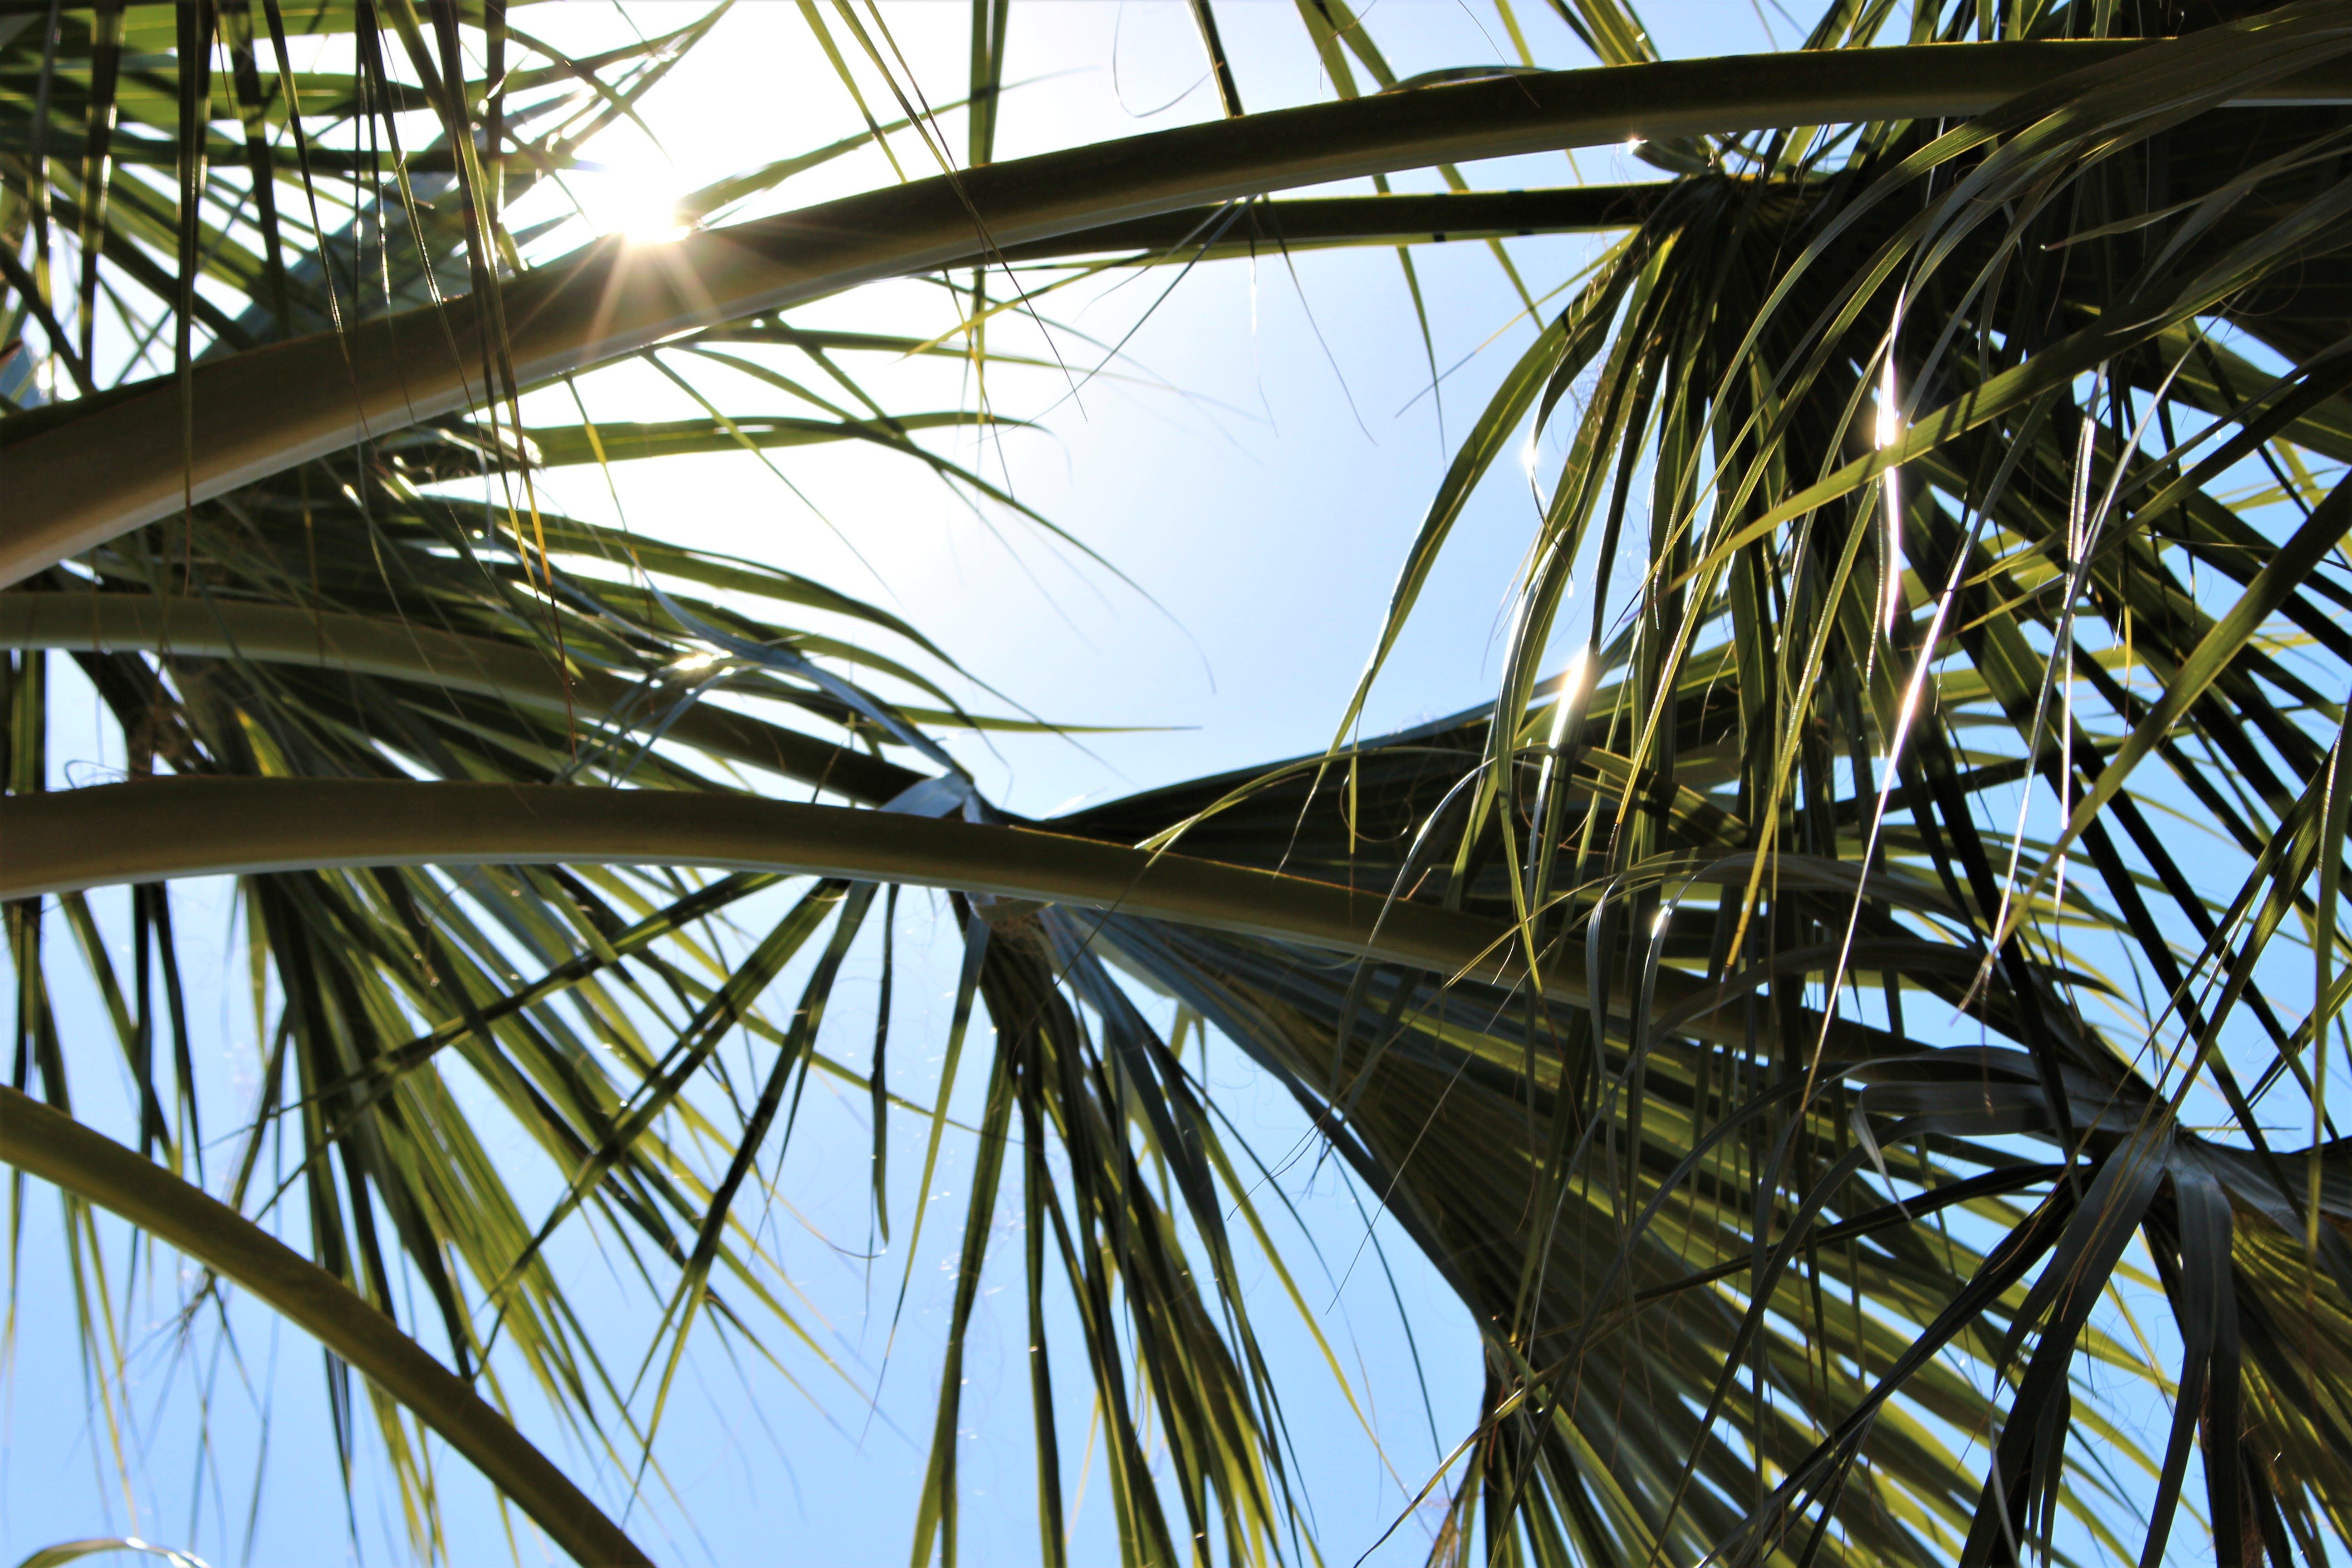 Kostenloses Stock Foto zu natur, palme, palmenblätter, sonne